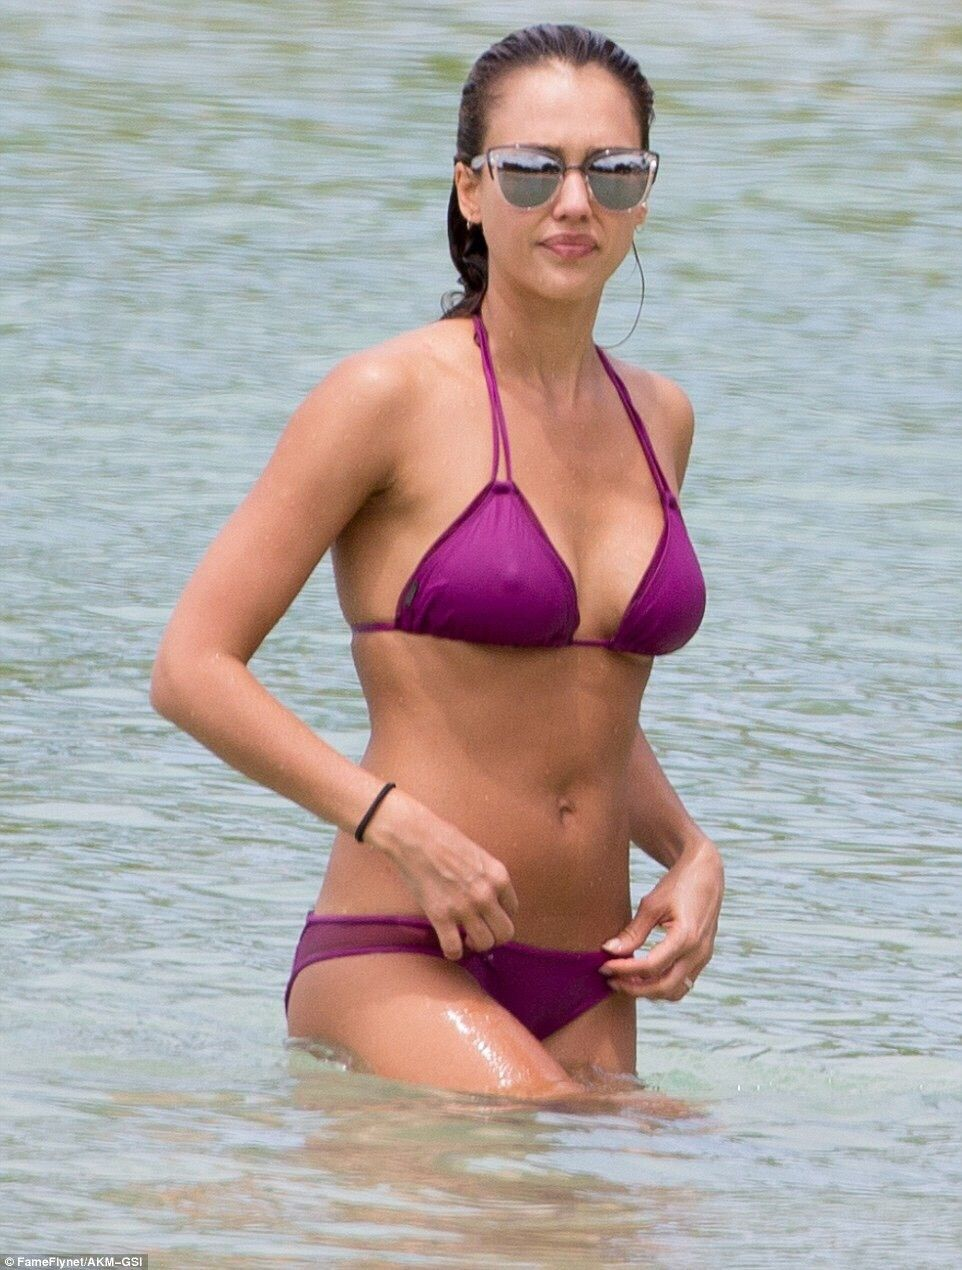 Bikini Jessica Alba nudes (89 foto and video), Topless, Paparazzi, Feet, braless 2015